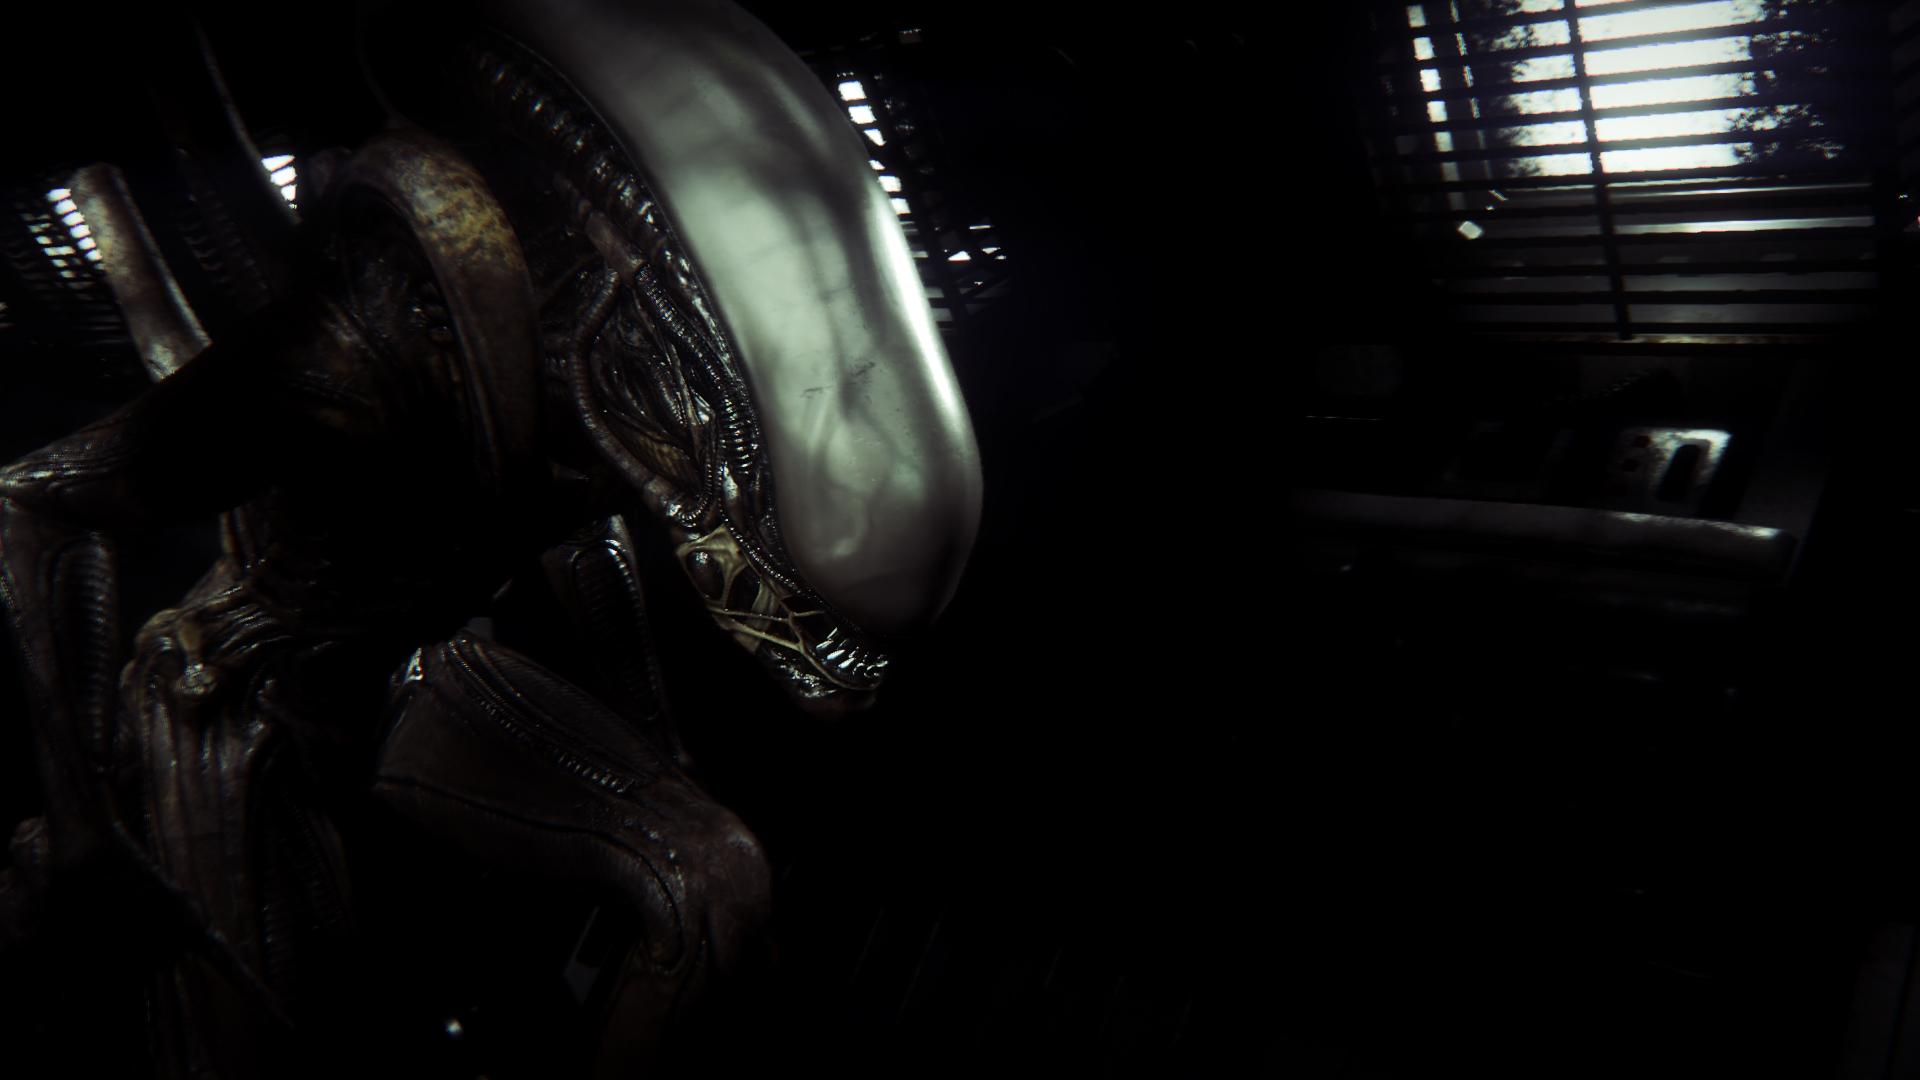 alien hd iphone wallpapers - photo #18